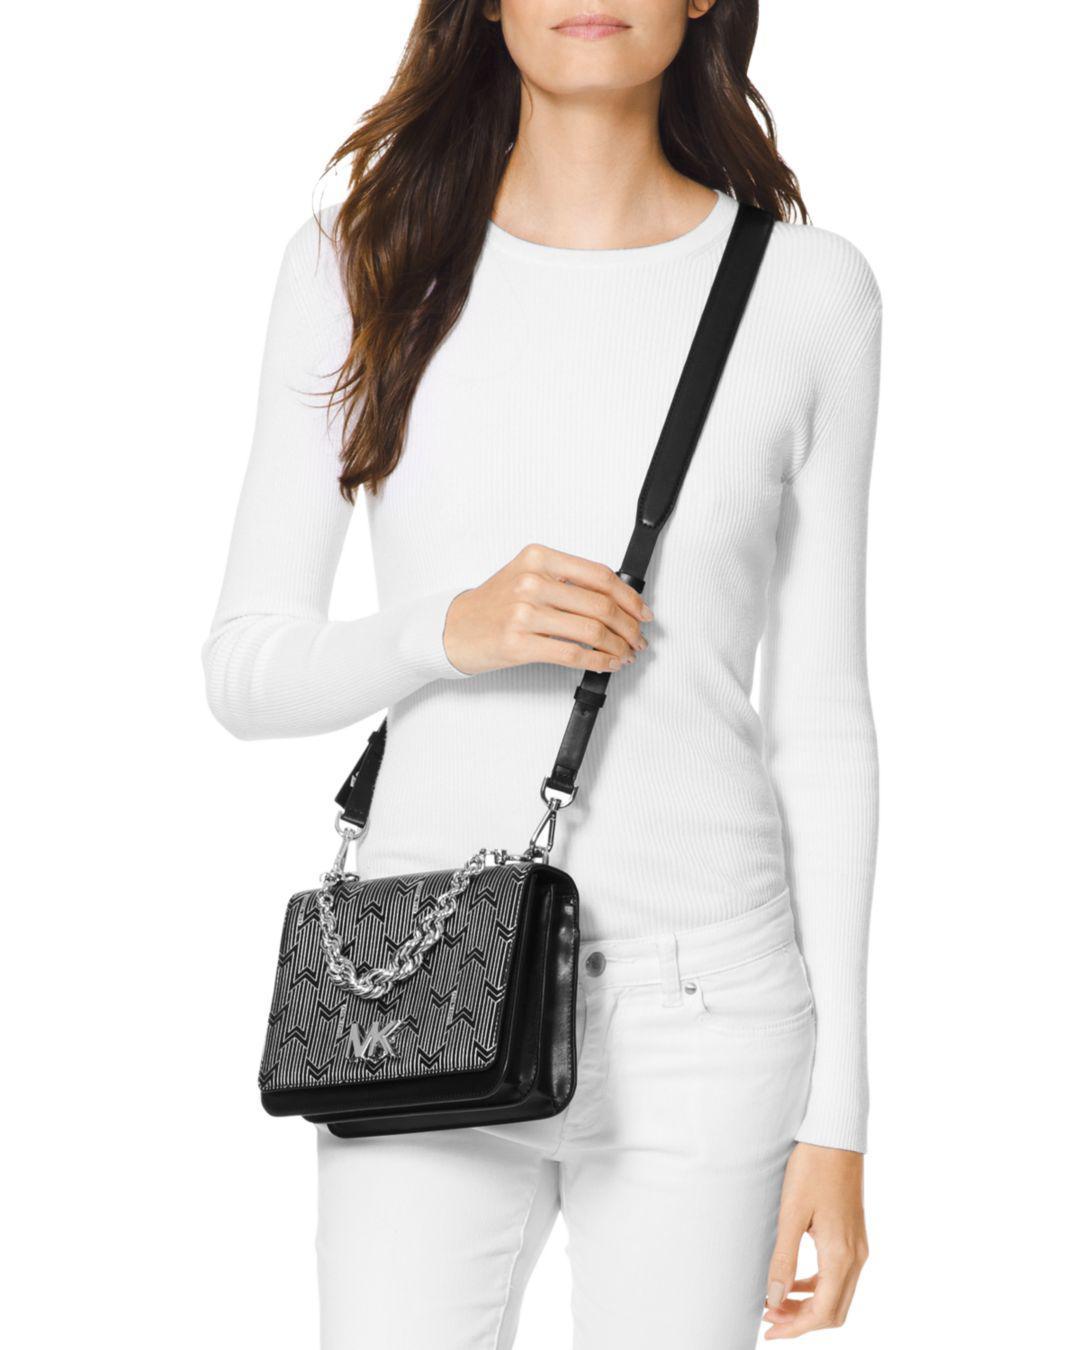 e3f7d802e3dc Lyst - MICHAEL Michael Kors Mott Leather Shoulder Bag in Metallic - Save 52%